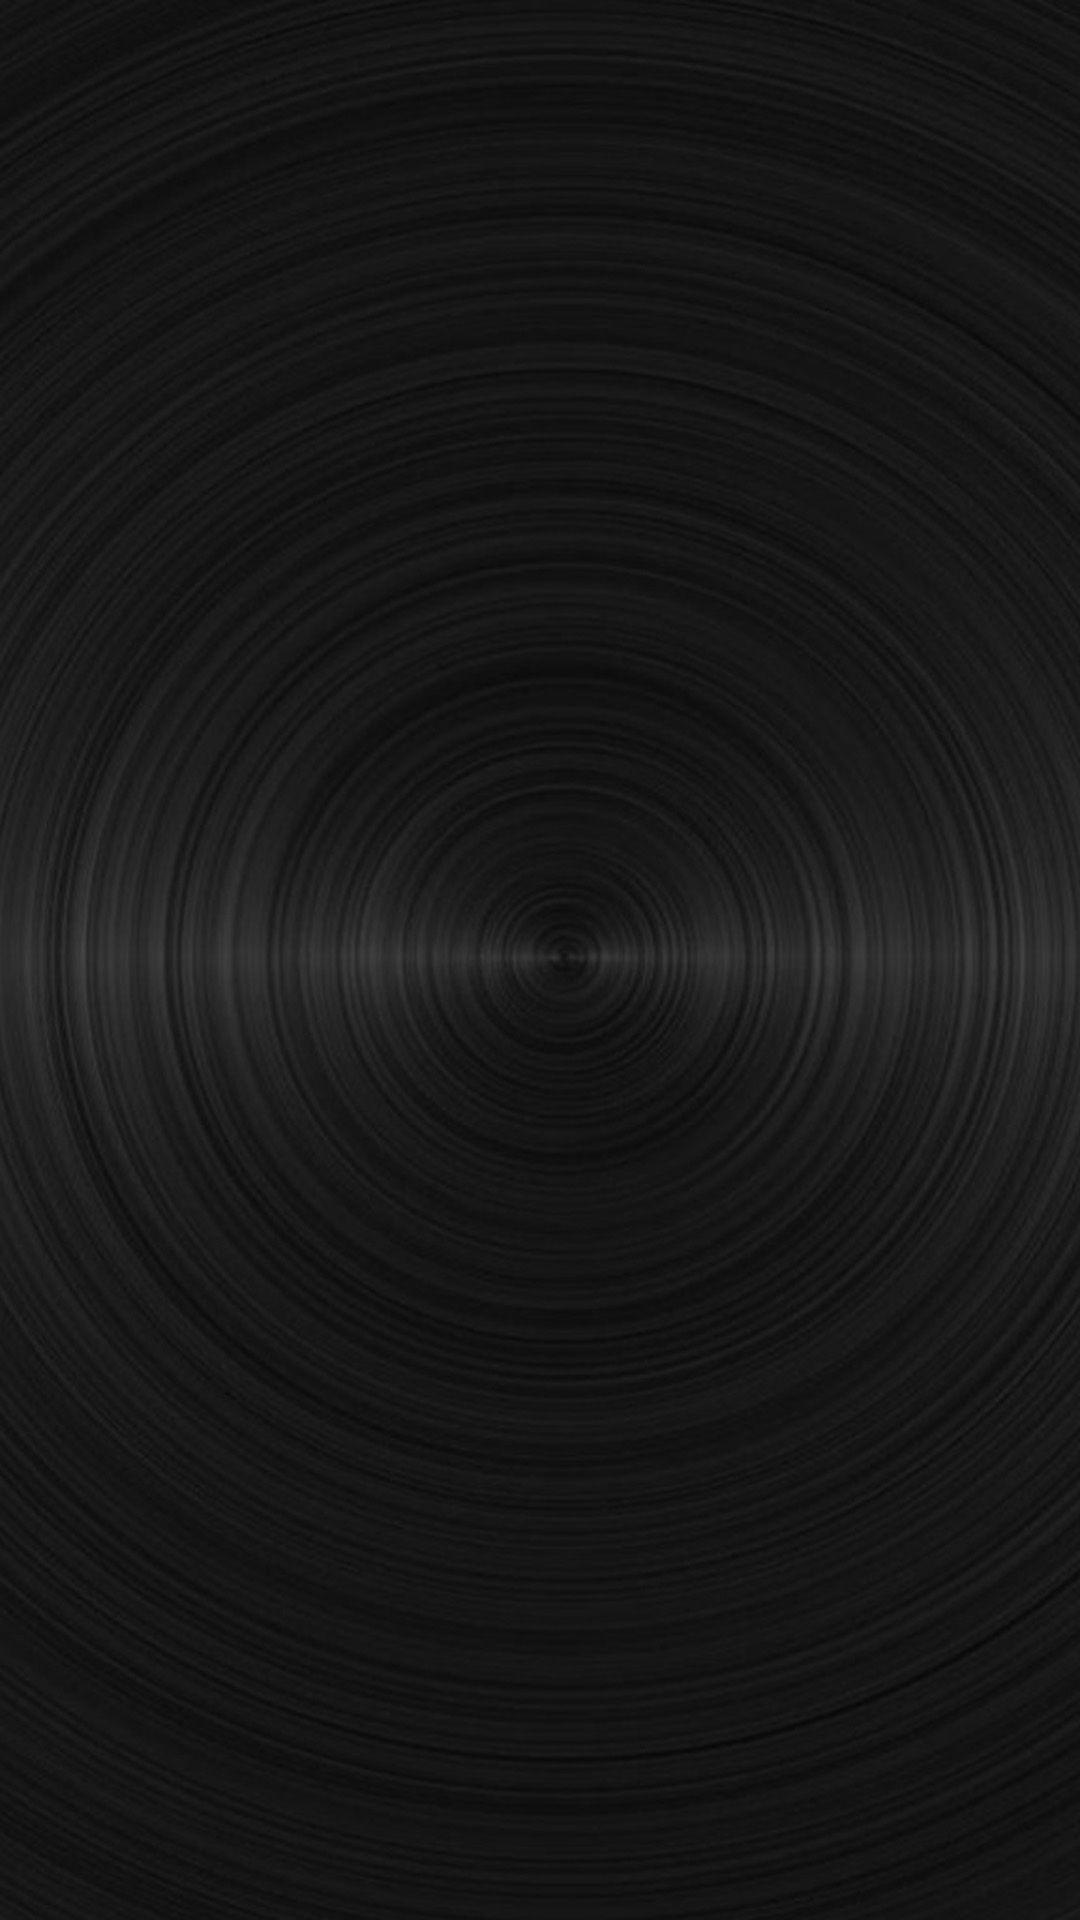 Download 8000+ Wallpaper Black Hd